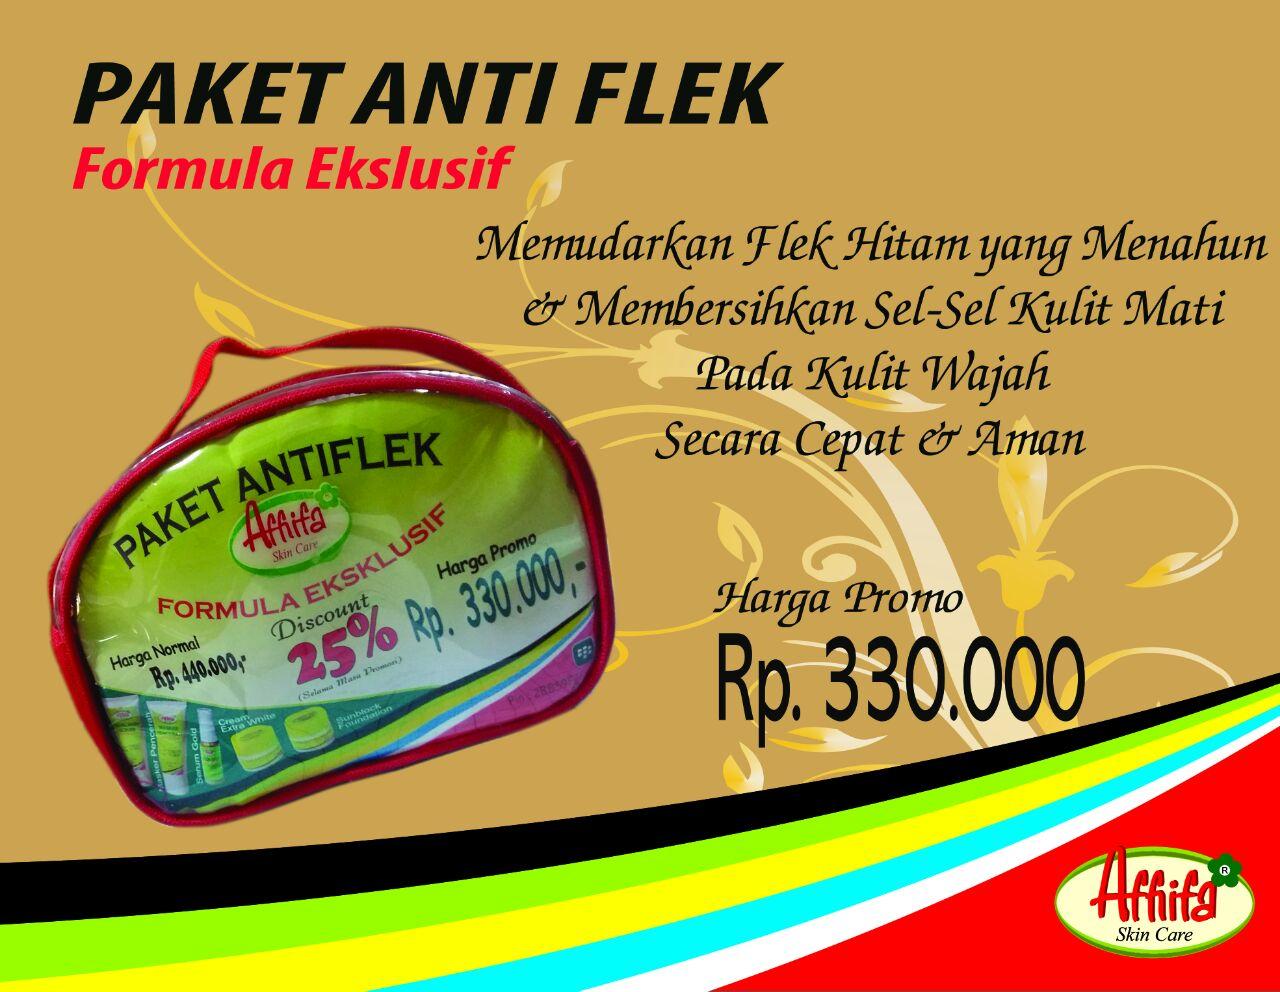 Paket Anti Flek Eksklusif